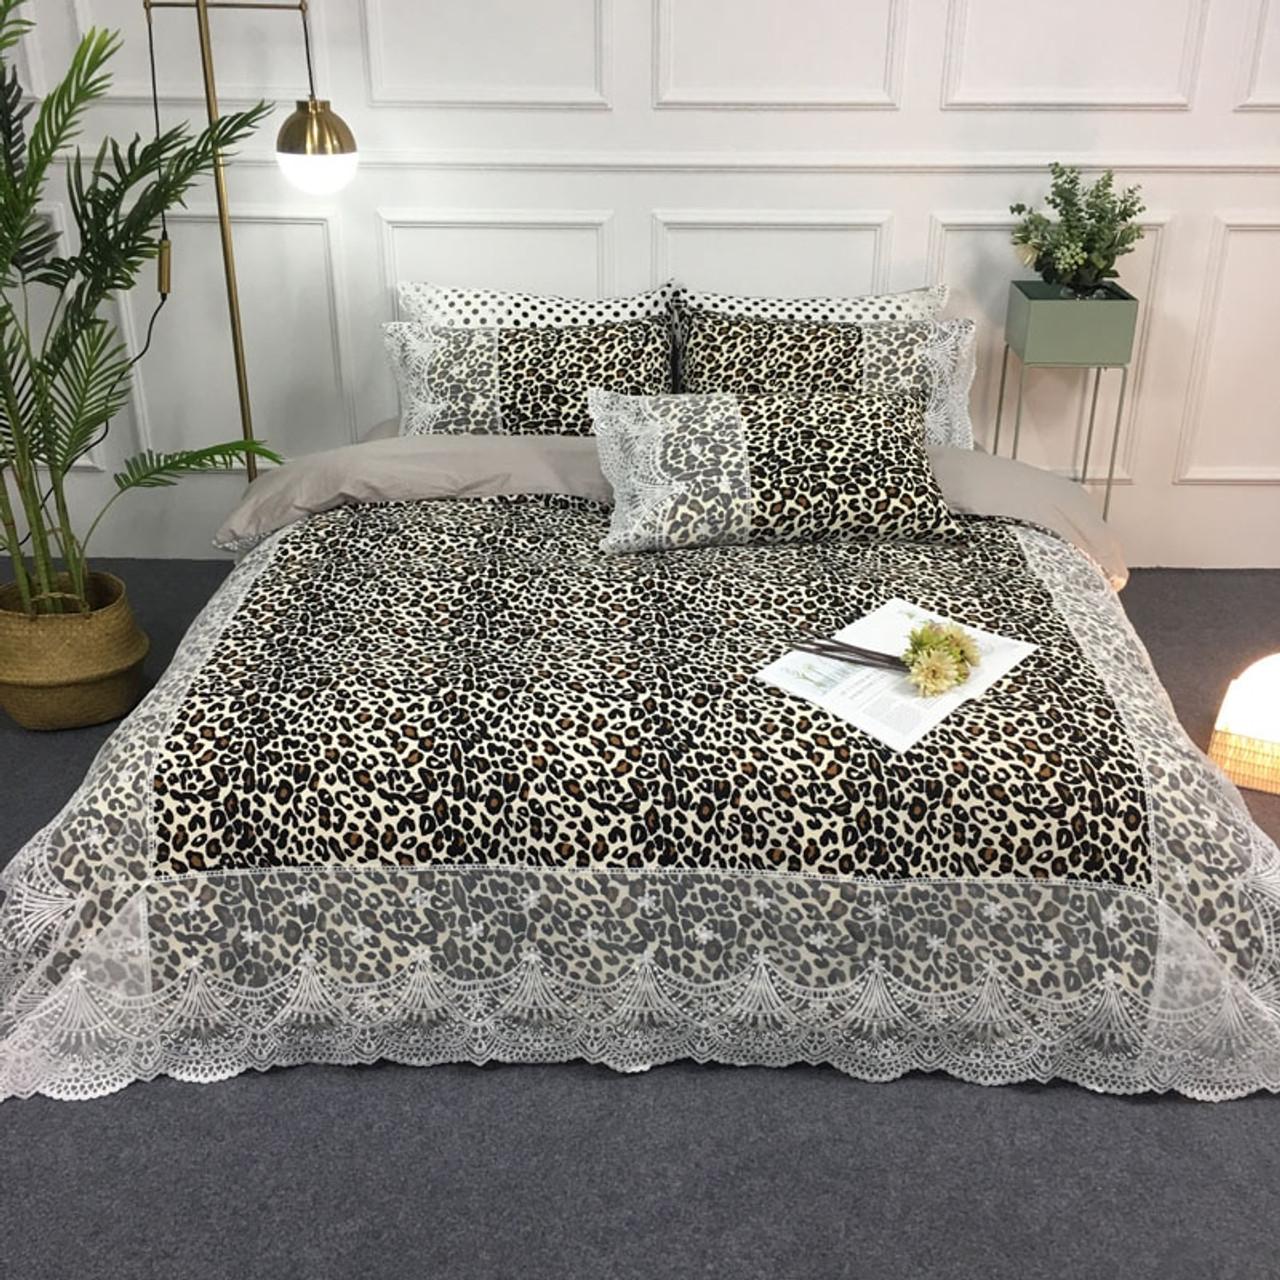 Satin Cotton White Lace Duvet Cover Set Queen King Size 4pcs Black Gray Dot Circle Leopard Bedding Set Bed Sheet Pillow Shams Onshopdeals Com